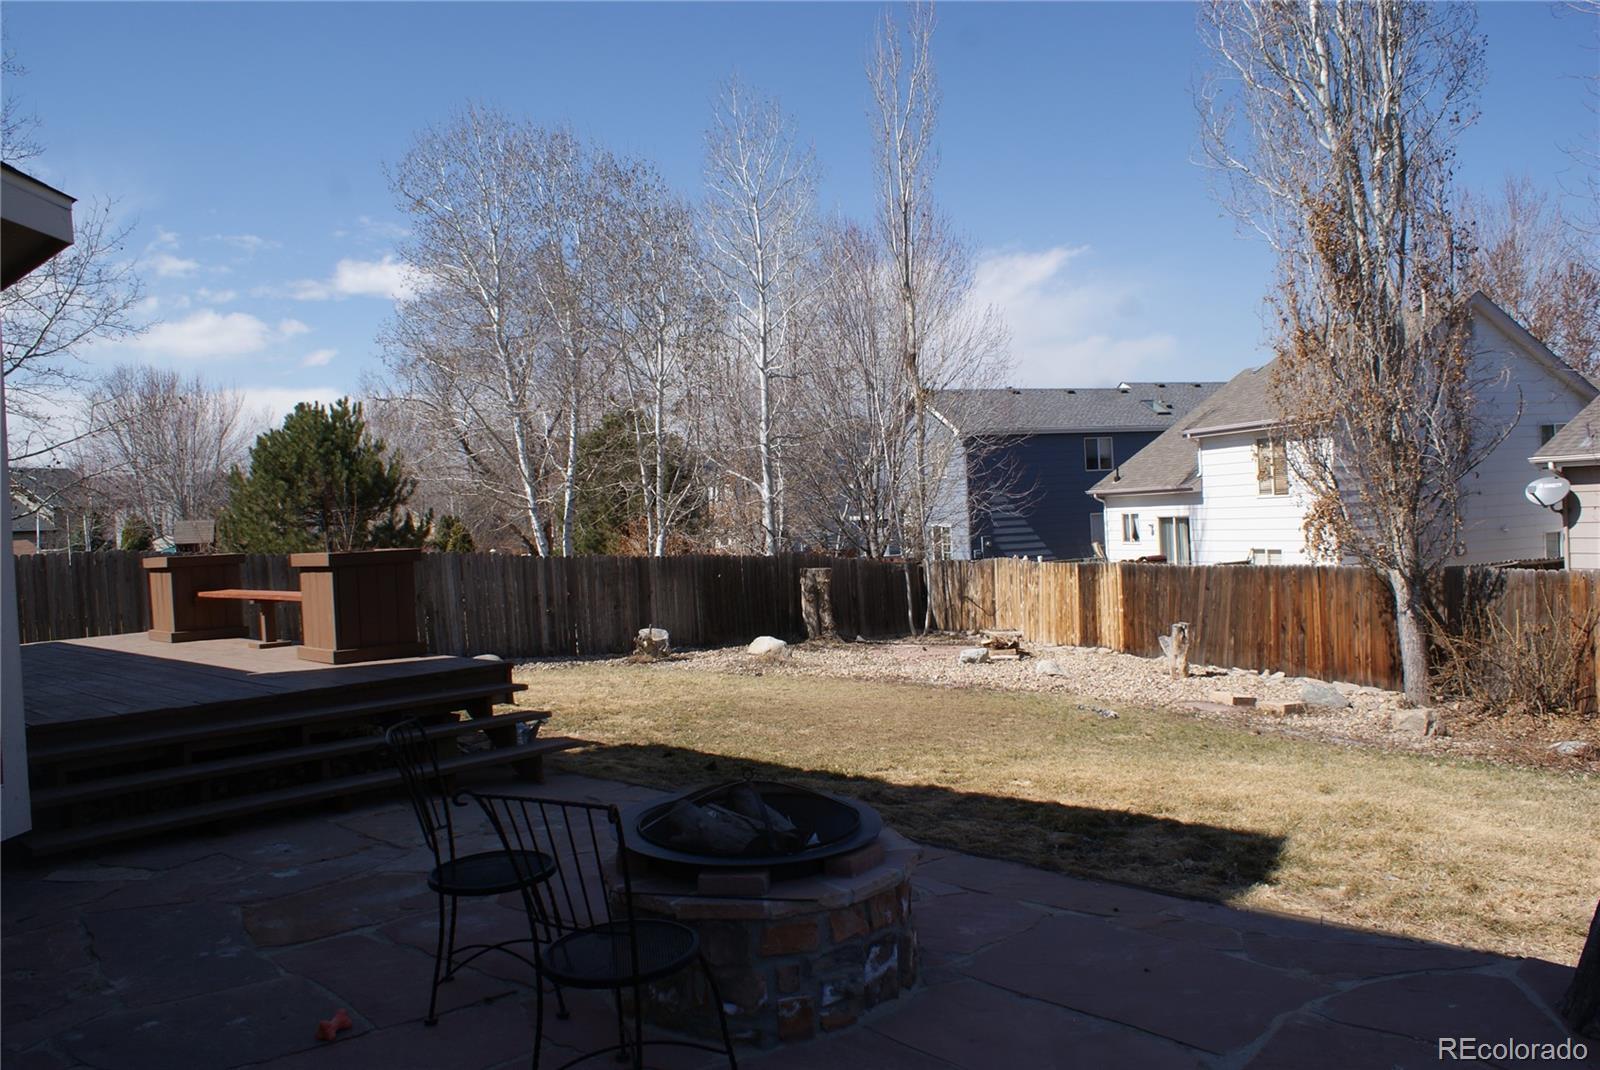 MLS# 4239148 - 18 - 6835 Quigley Circle, Firestone, CO 80504